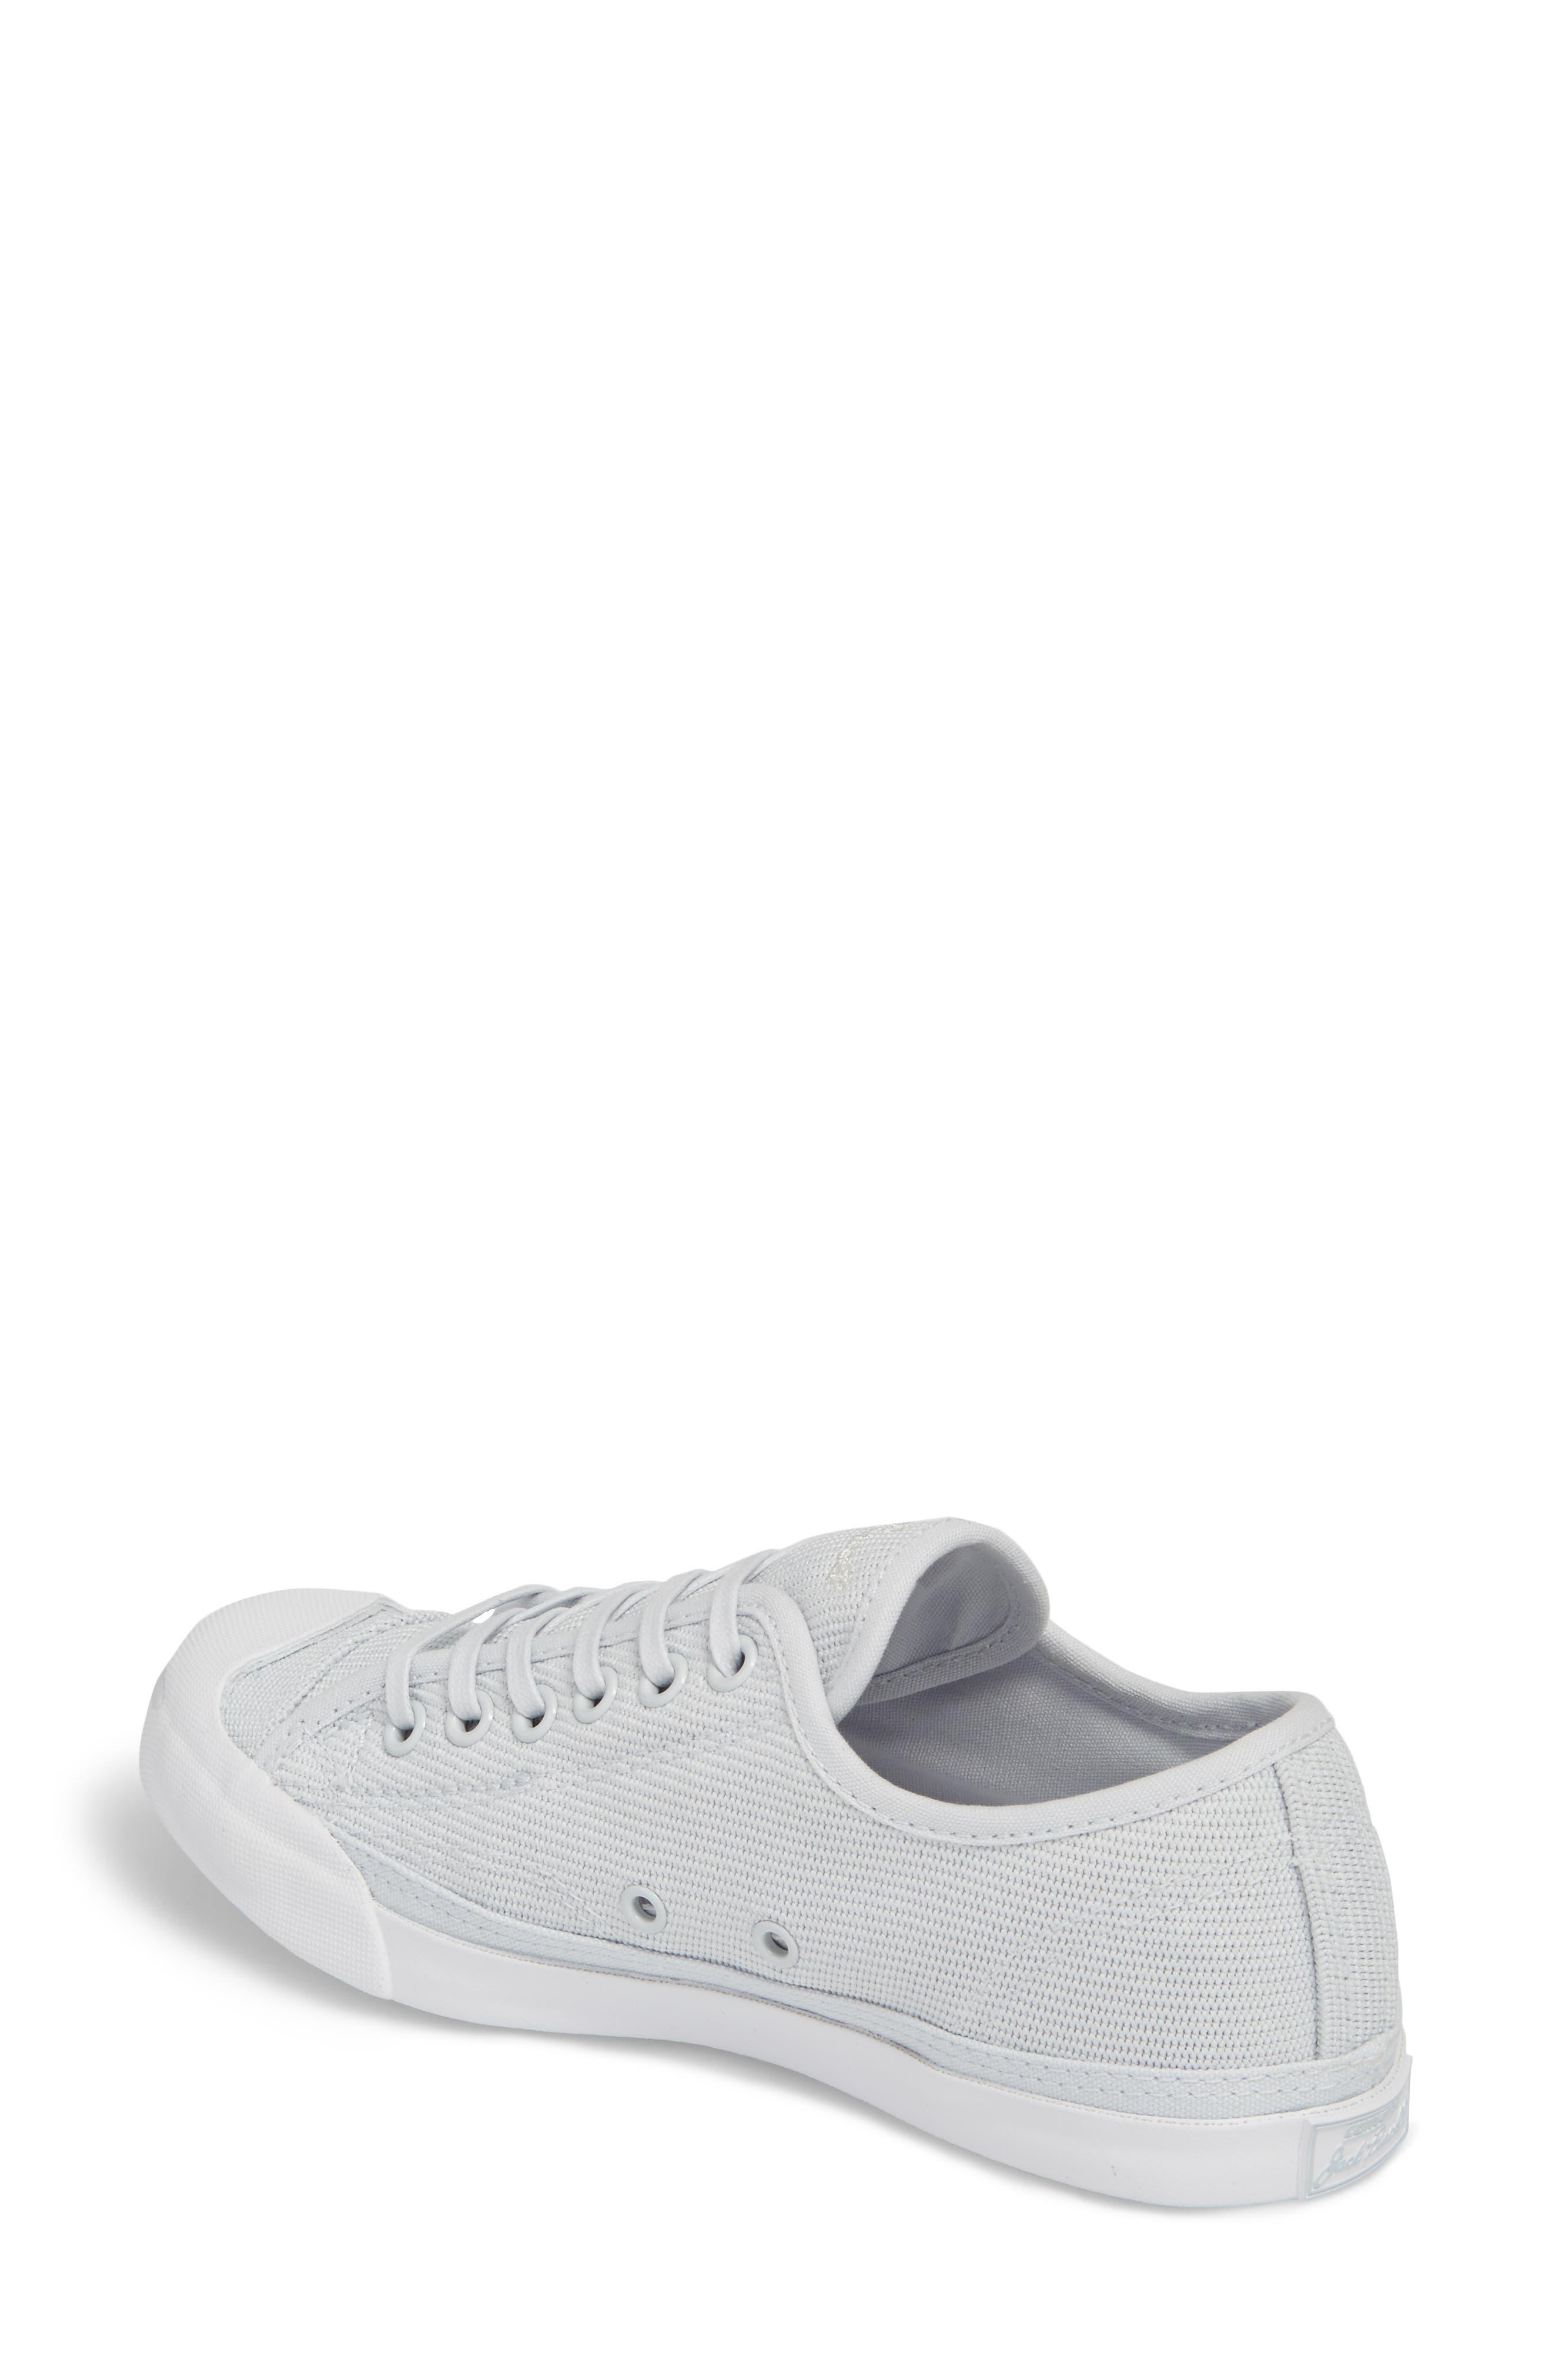 Jack Purcell Low Top Sneaker,                             Alternate thumbnail 2, color,                             PURE PLATINUM